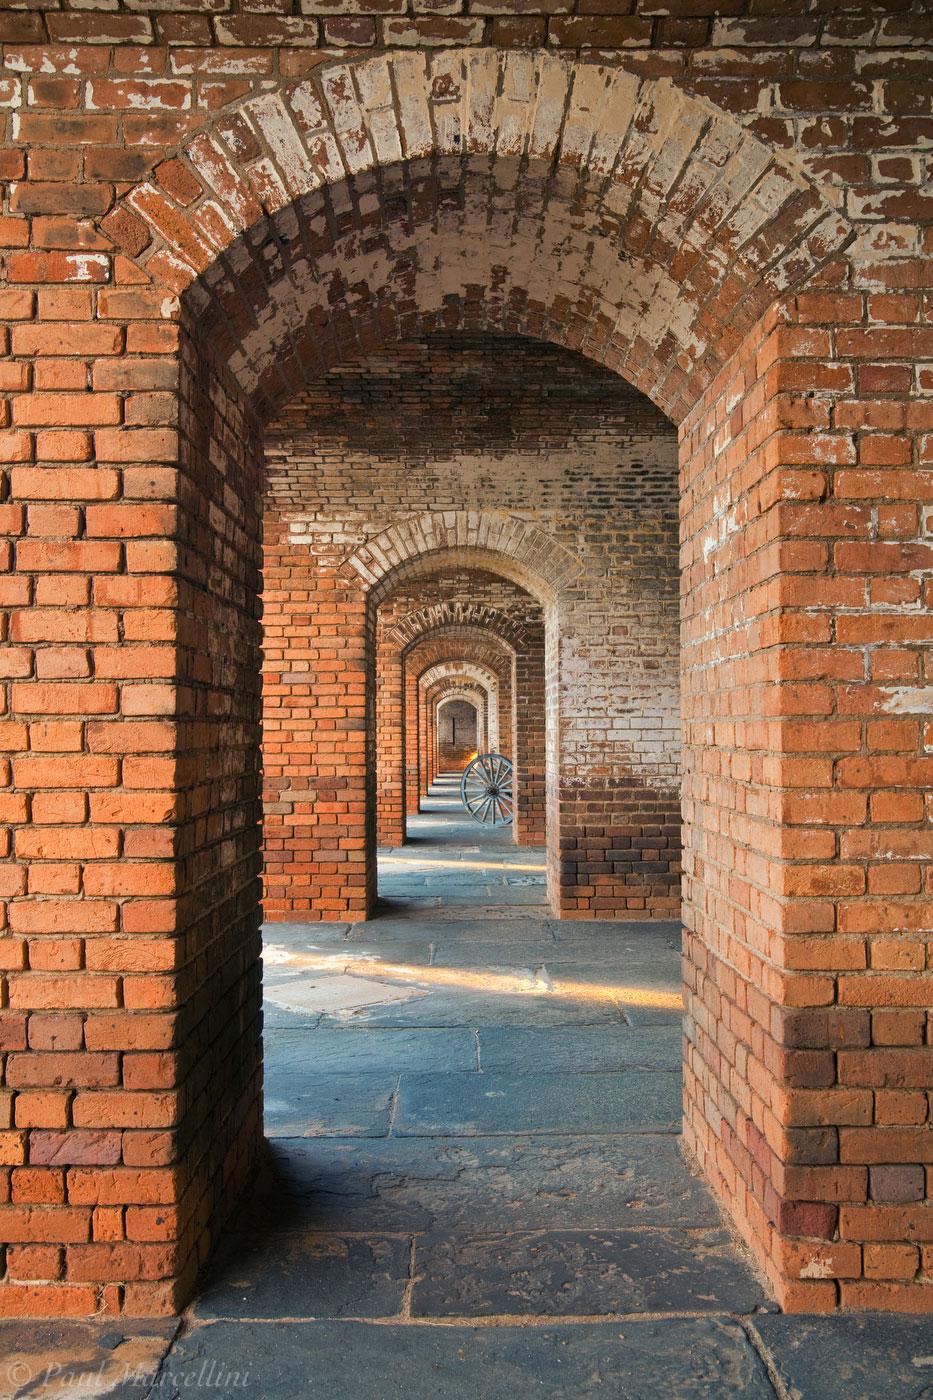 ft. jefferson, brick, hallway, arch, dry tortugas, florida, fort jefferson, keys, south florida, nature, photography,, photo